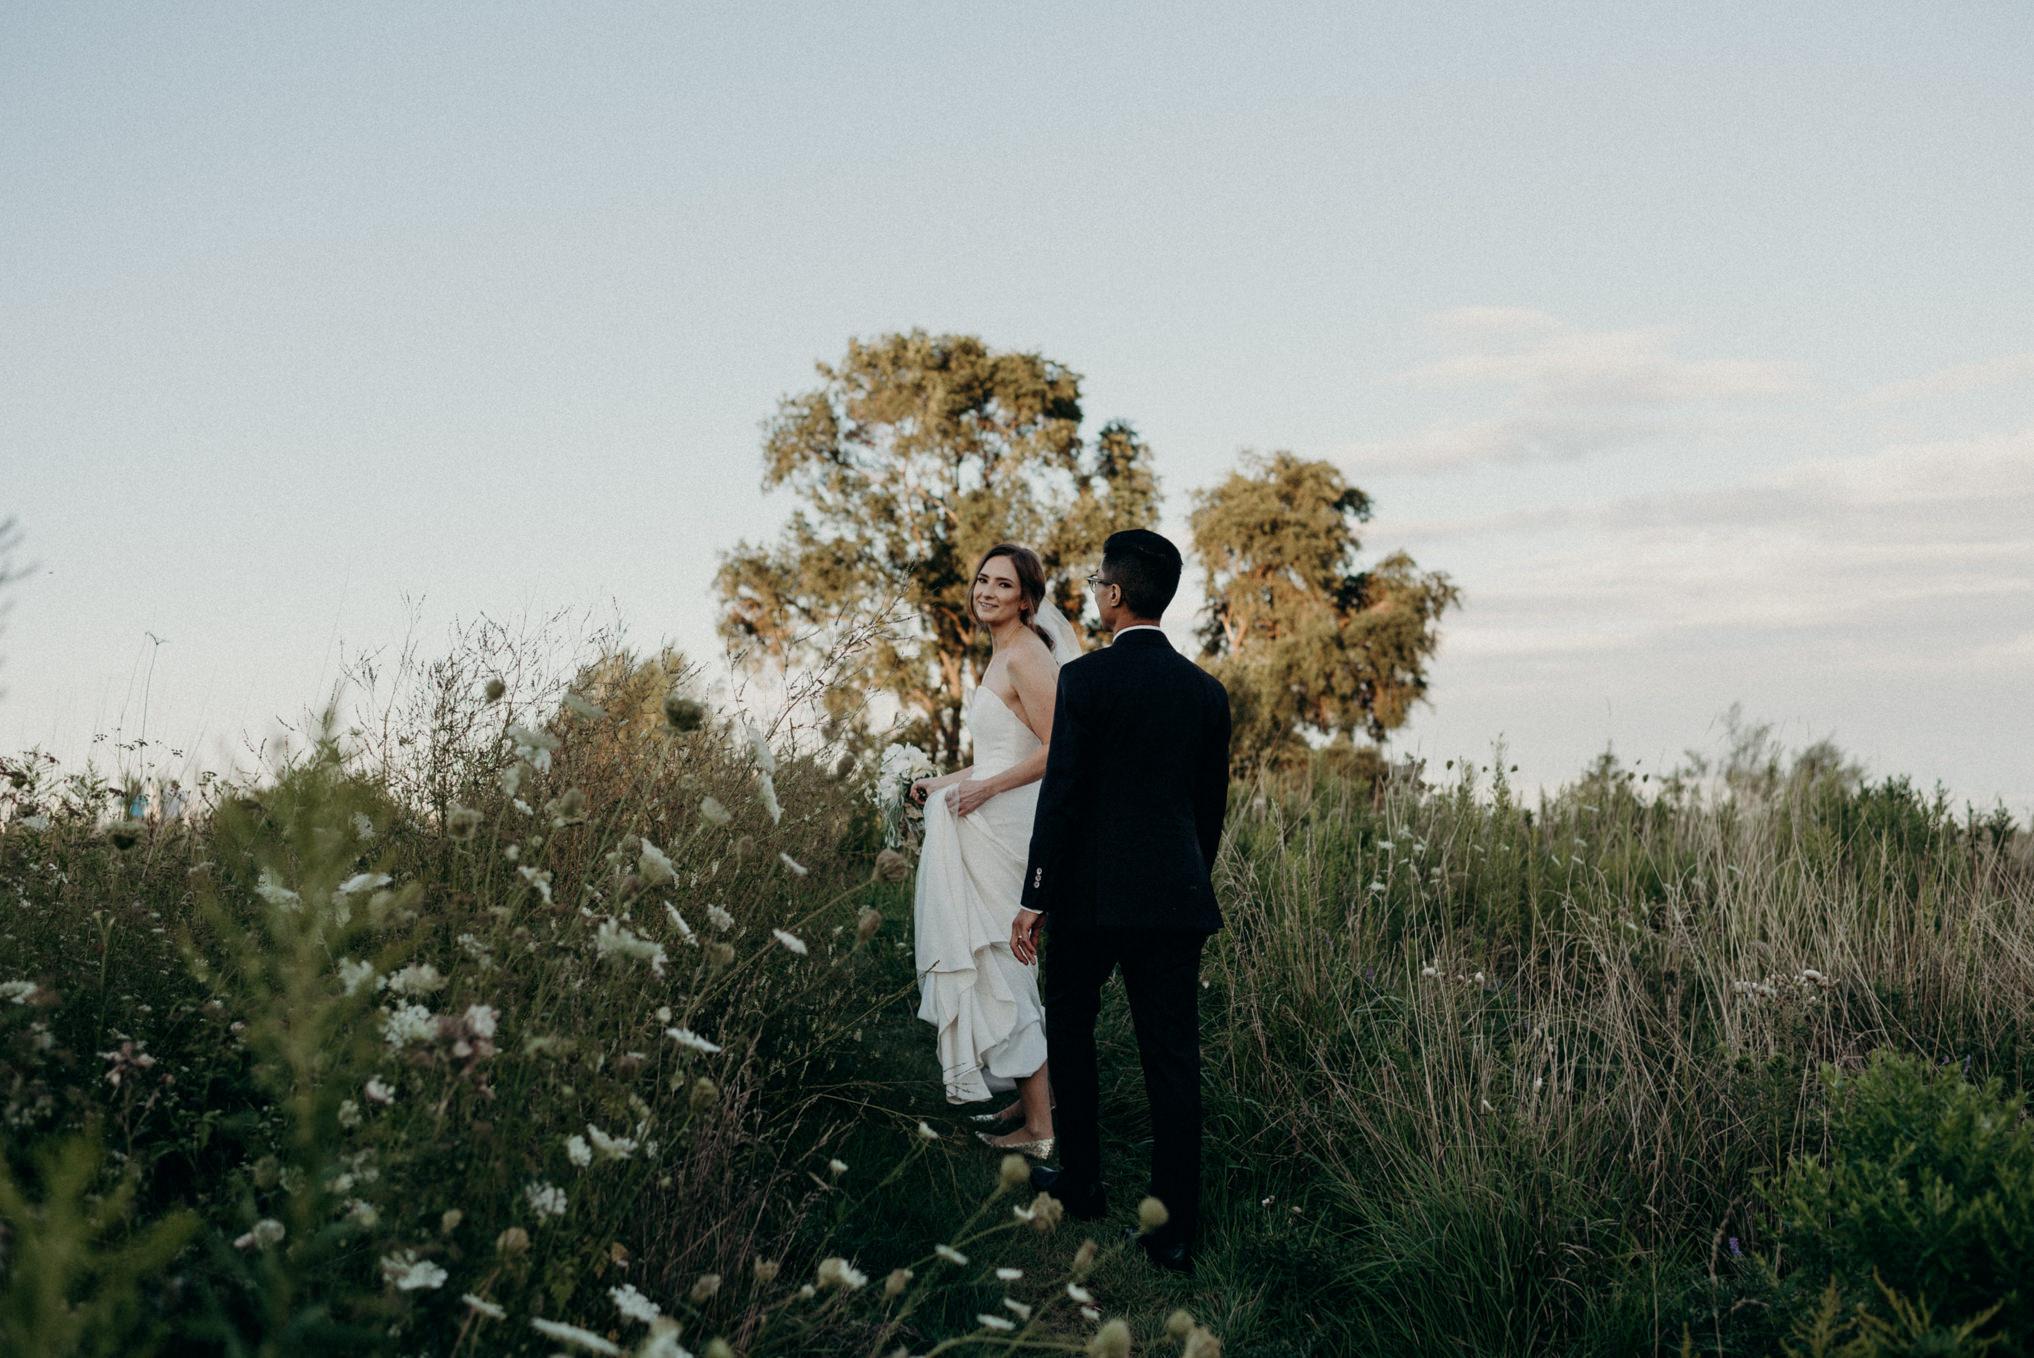 Bride and groom walking on path at Humber Bay